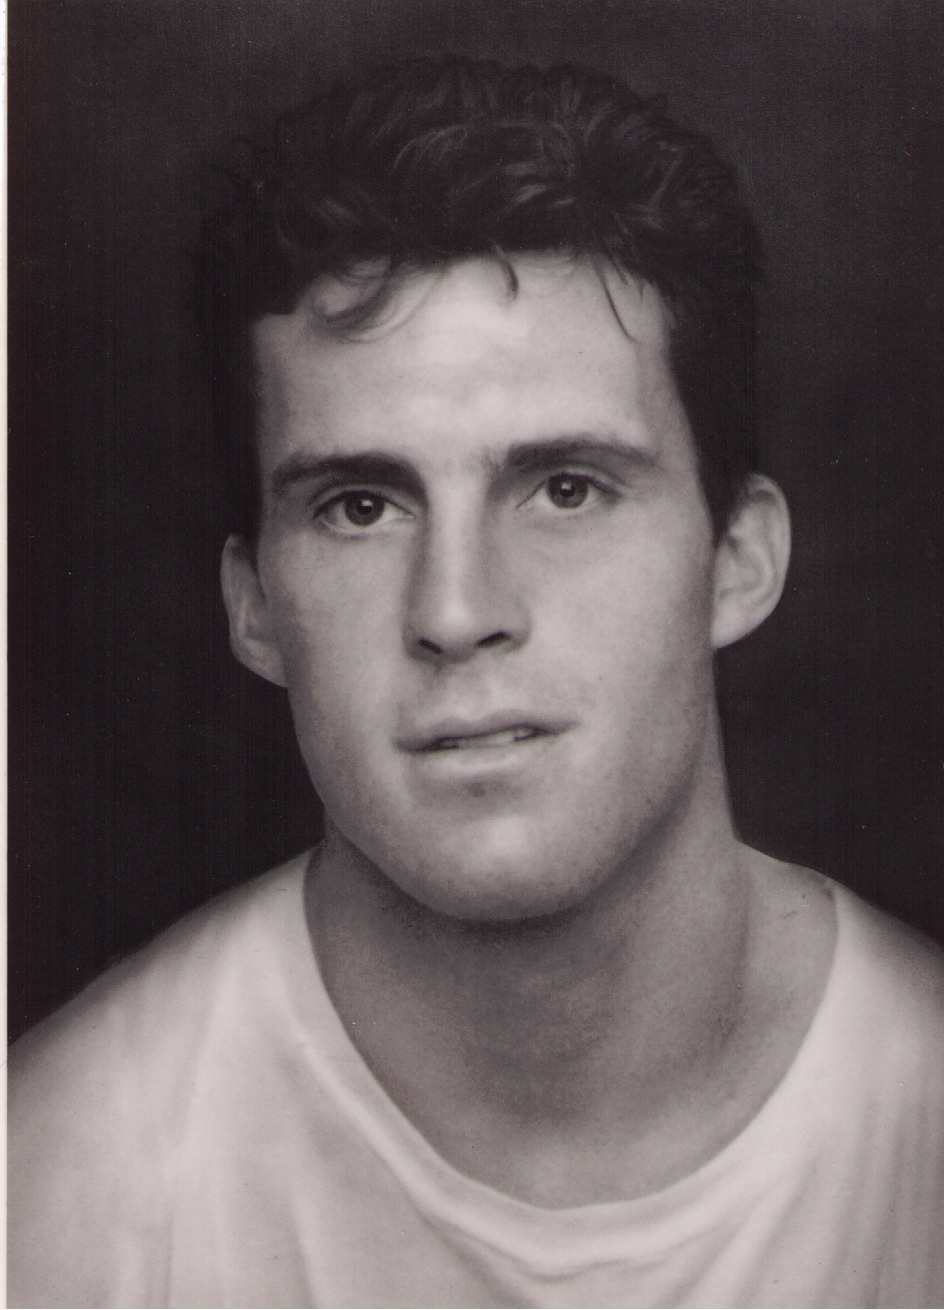 Duncan MacPherson